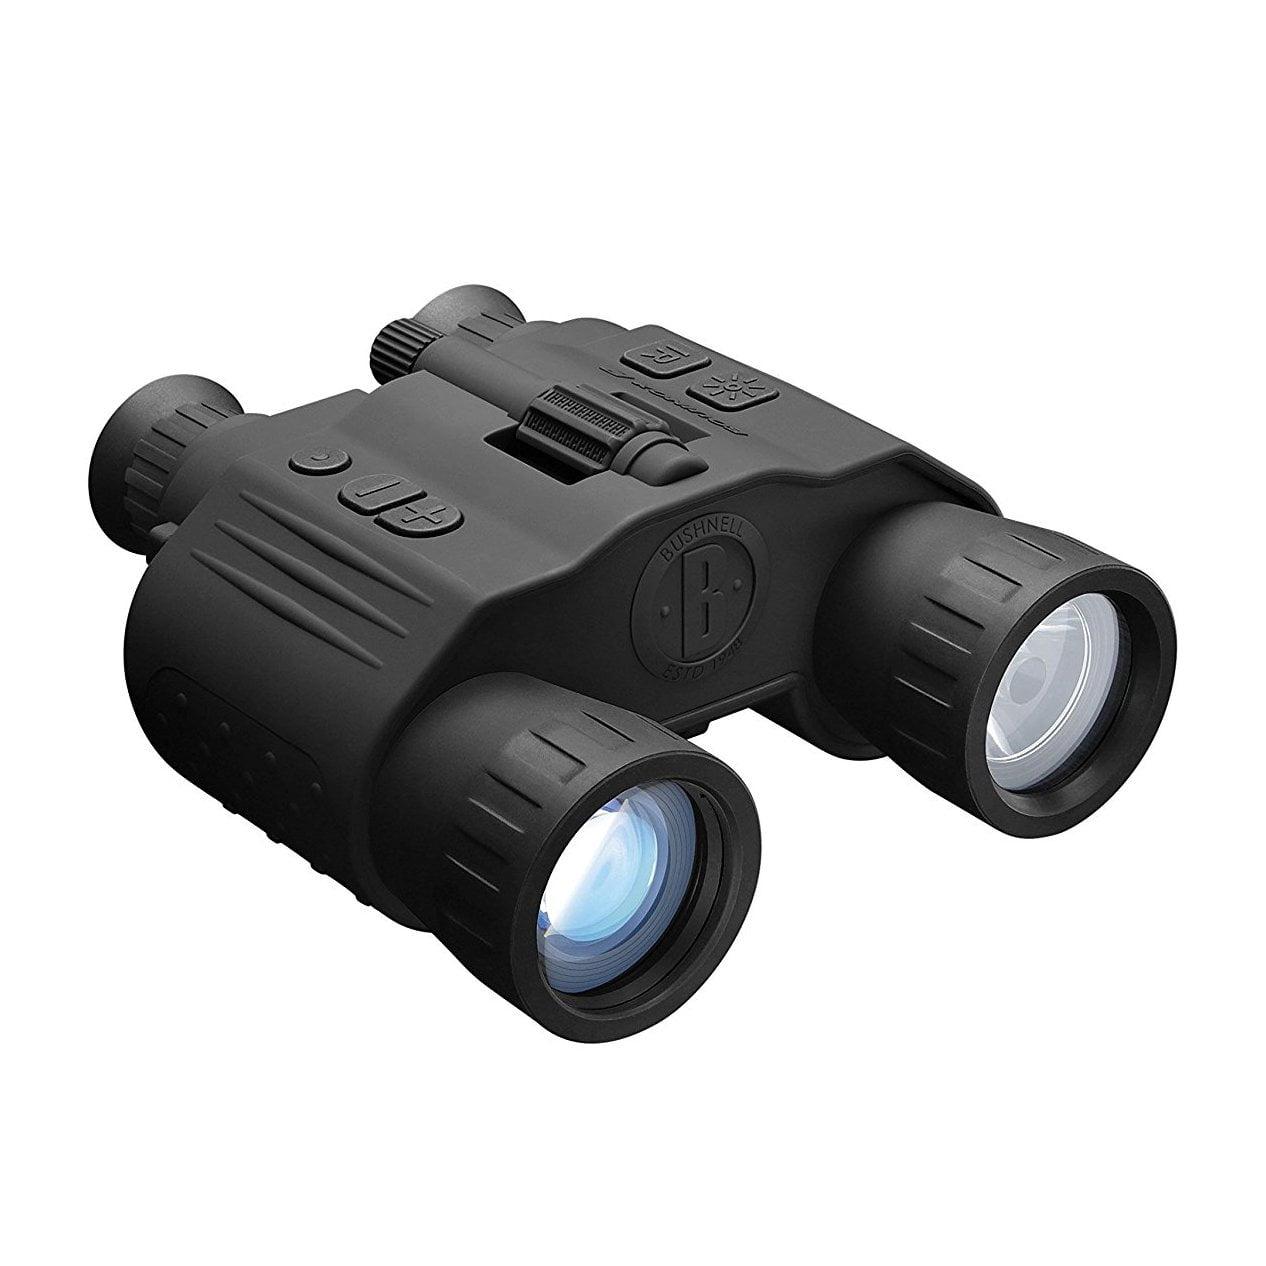 Click here to buy Bushnell Equinox 260500 2X40 Z Digital Night Vision Binocular Black Box 6L by Bushnell.